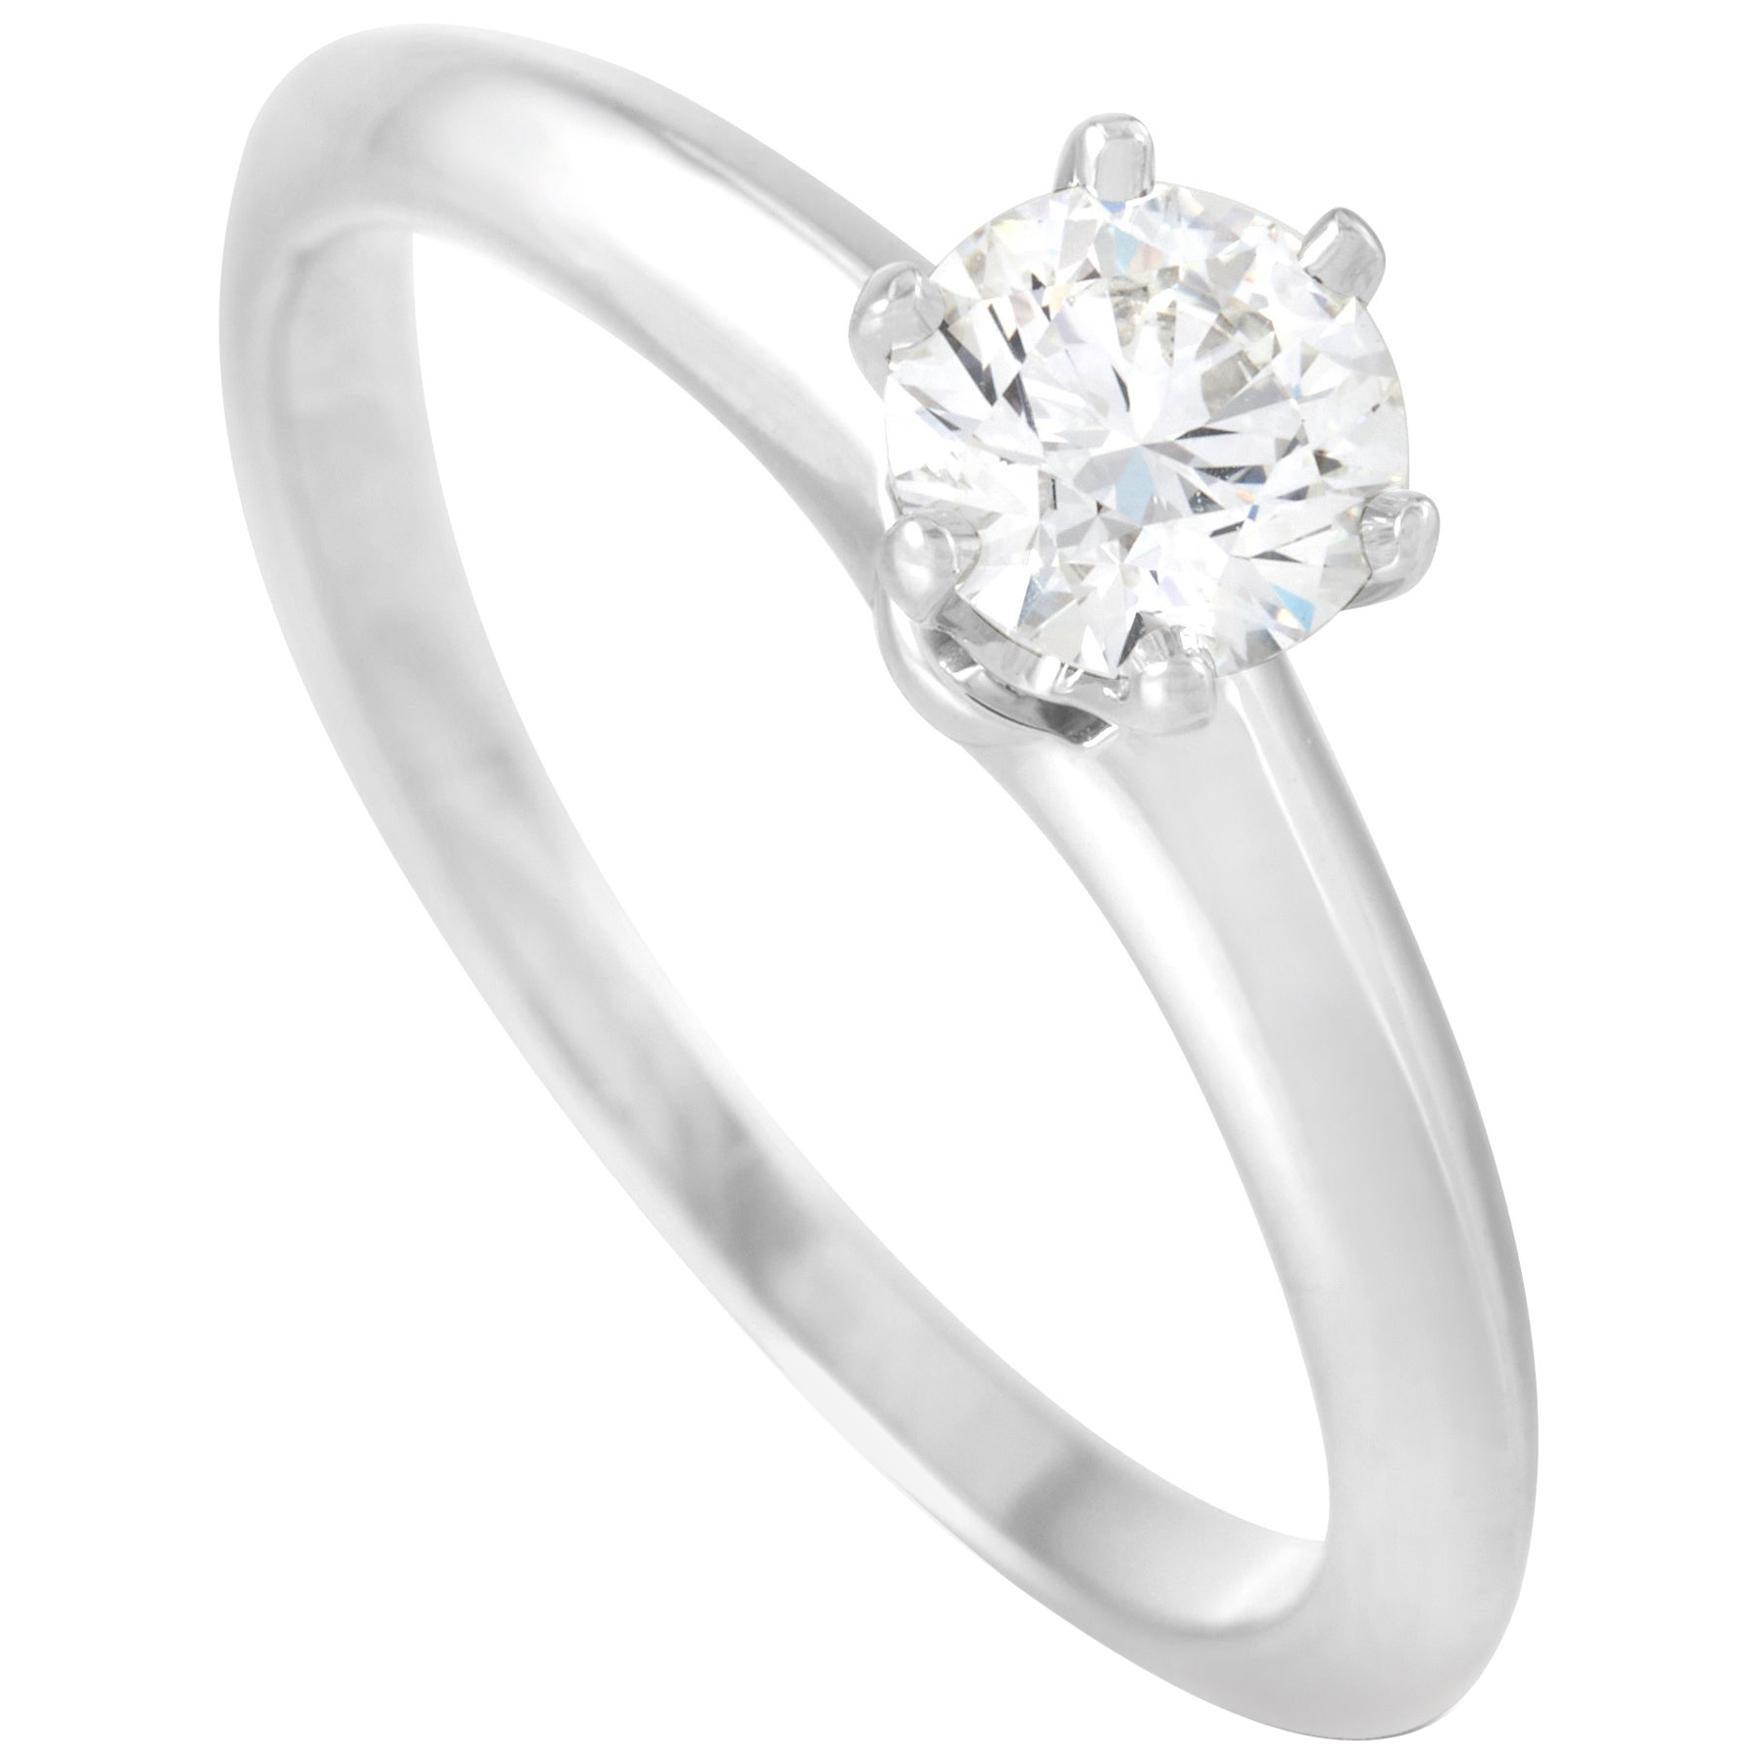 Tiffany & Co. Platinum 0.48 Carat Diamond Solitaire Ring